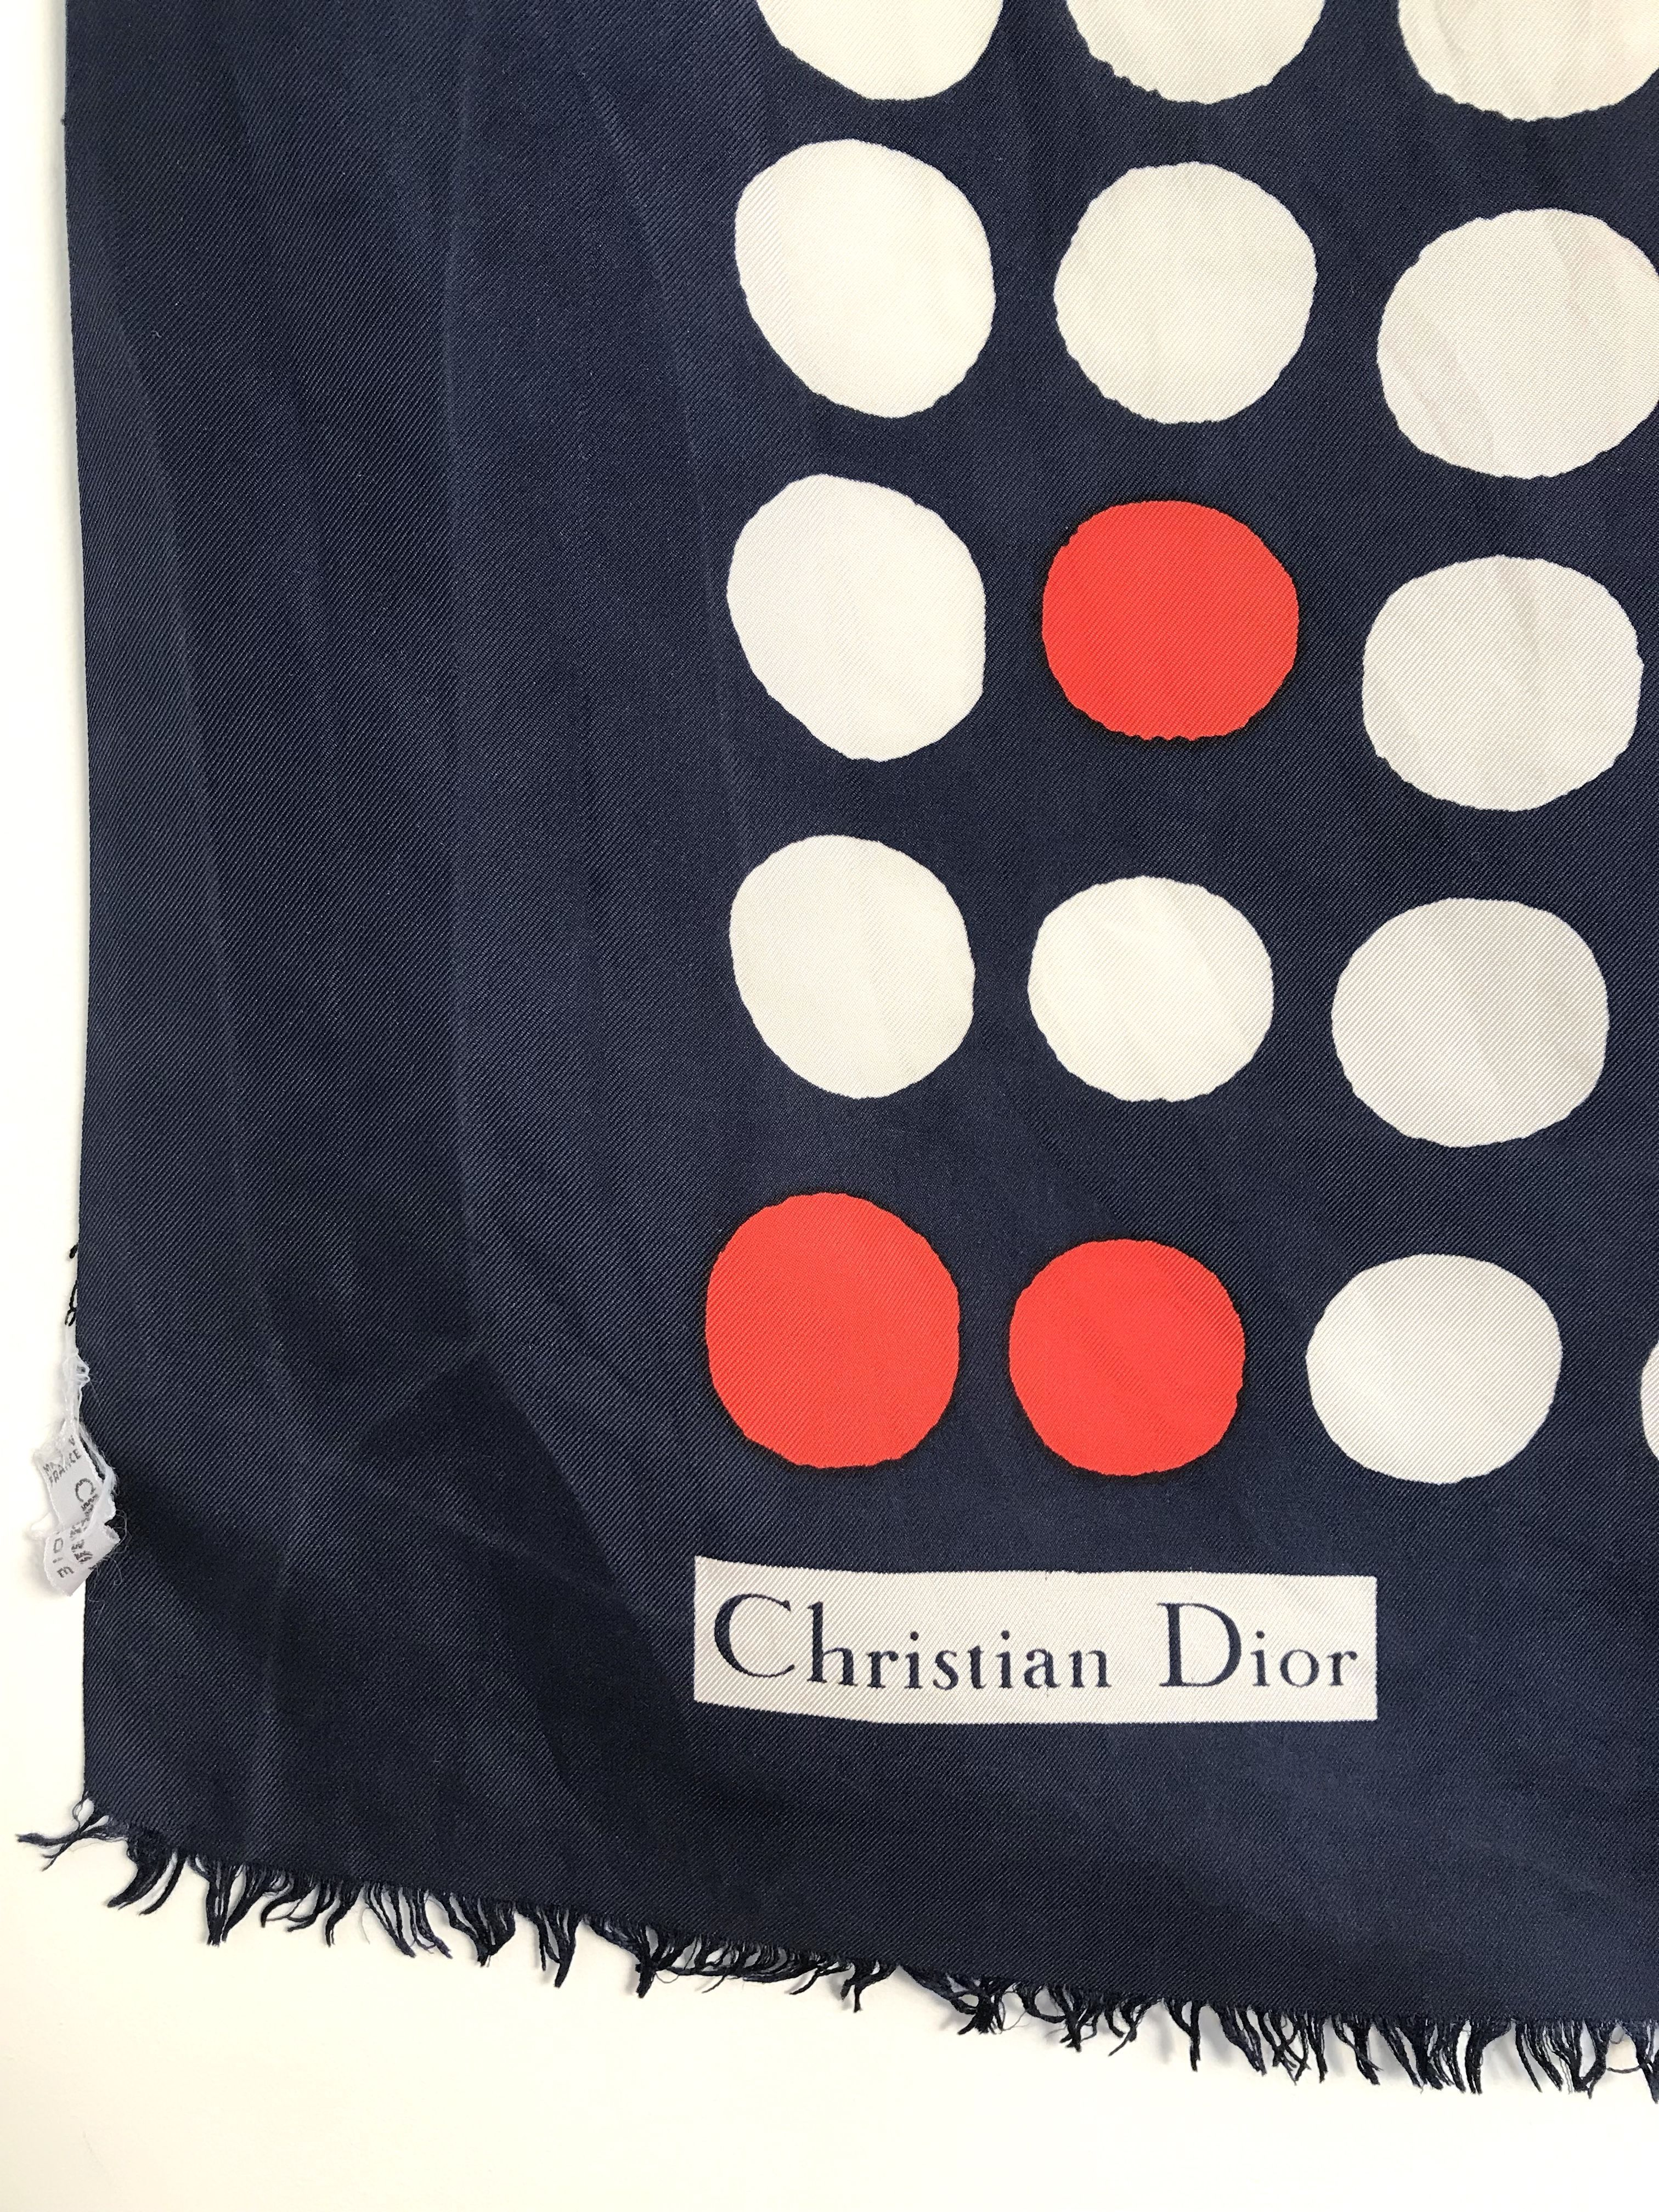 Accessoires - Écharpe Christian Dior